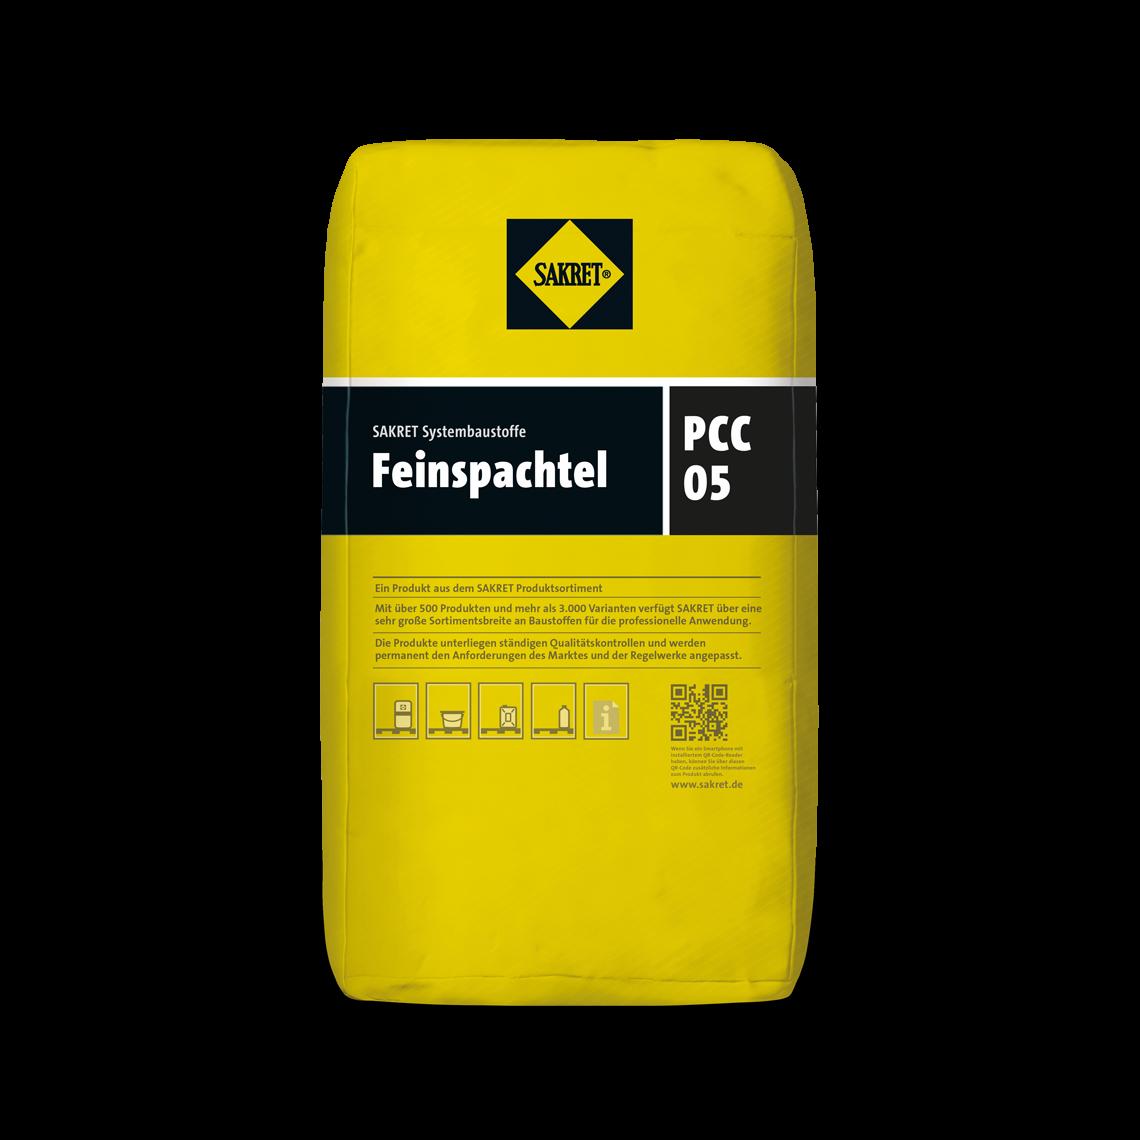 Abbildung SAKRET Feinspachtel PCC 05